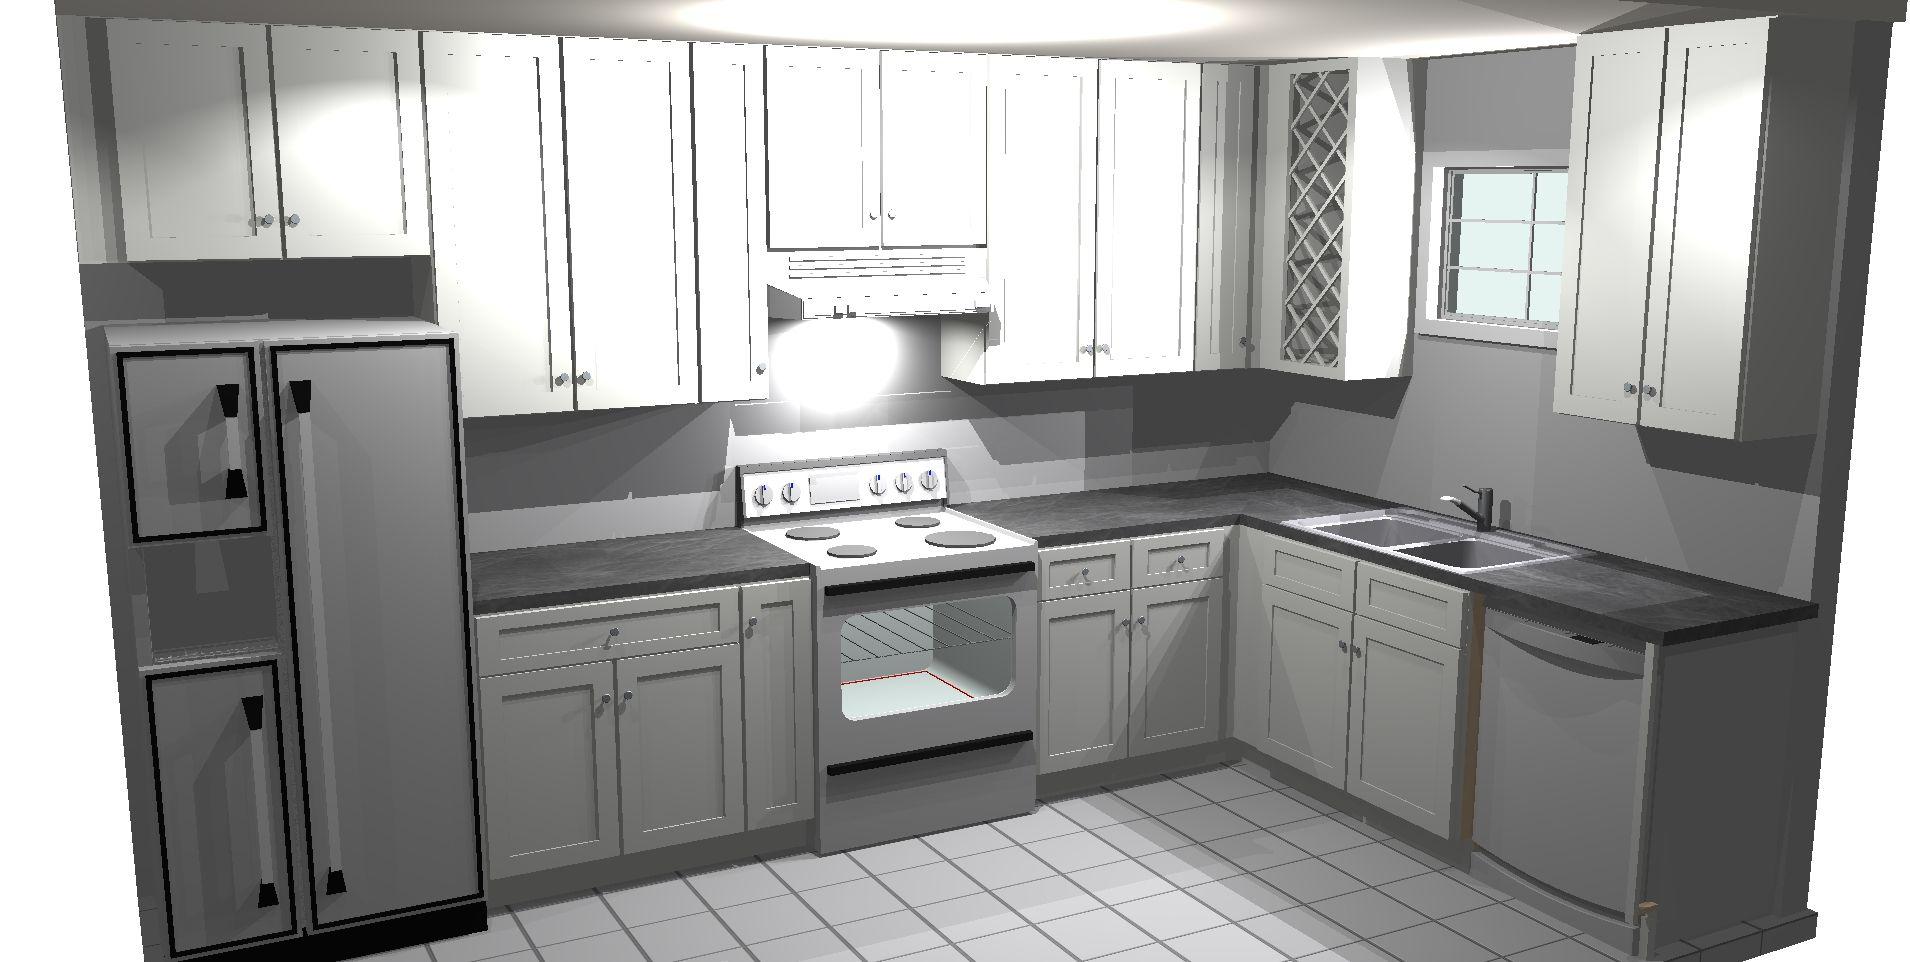 Cabinets To Go Platinum Grey Base Cabinets Nantucket 42 H Wall Cabinets Cabinets To Go Platinum Grey Kitchen Remodel